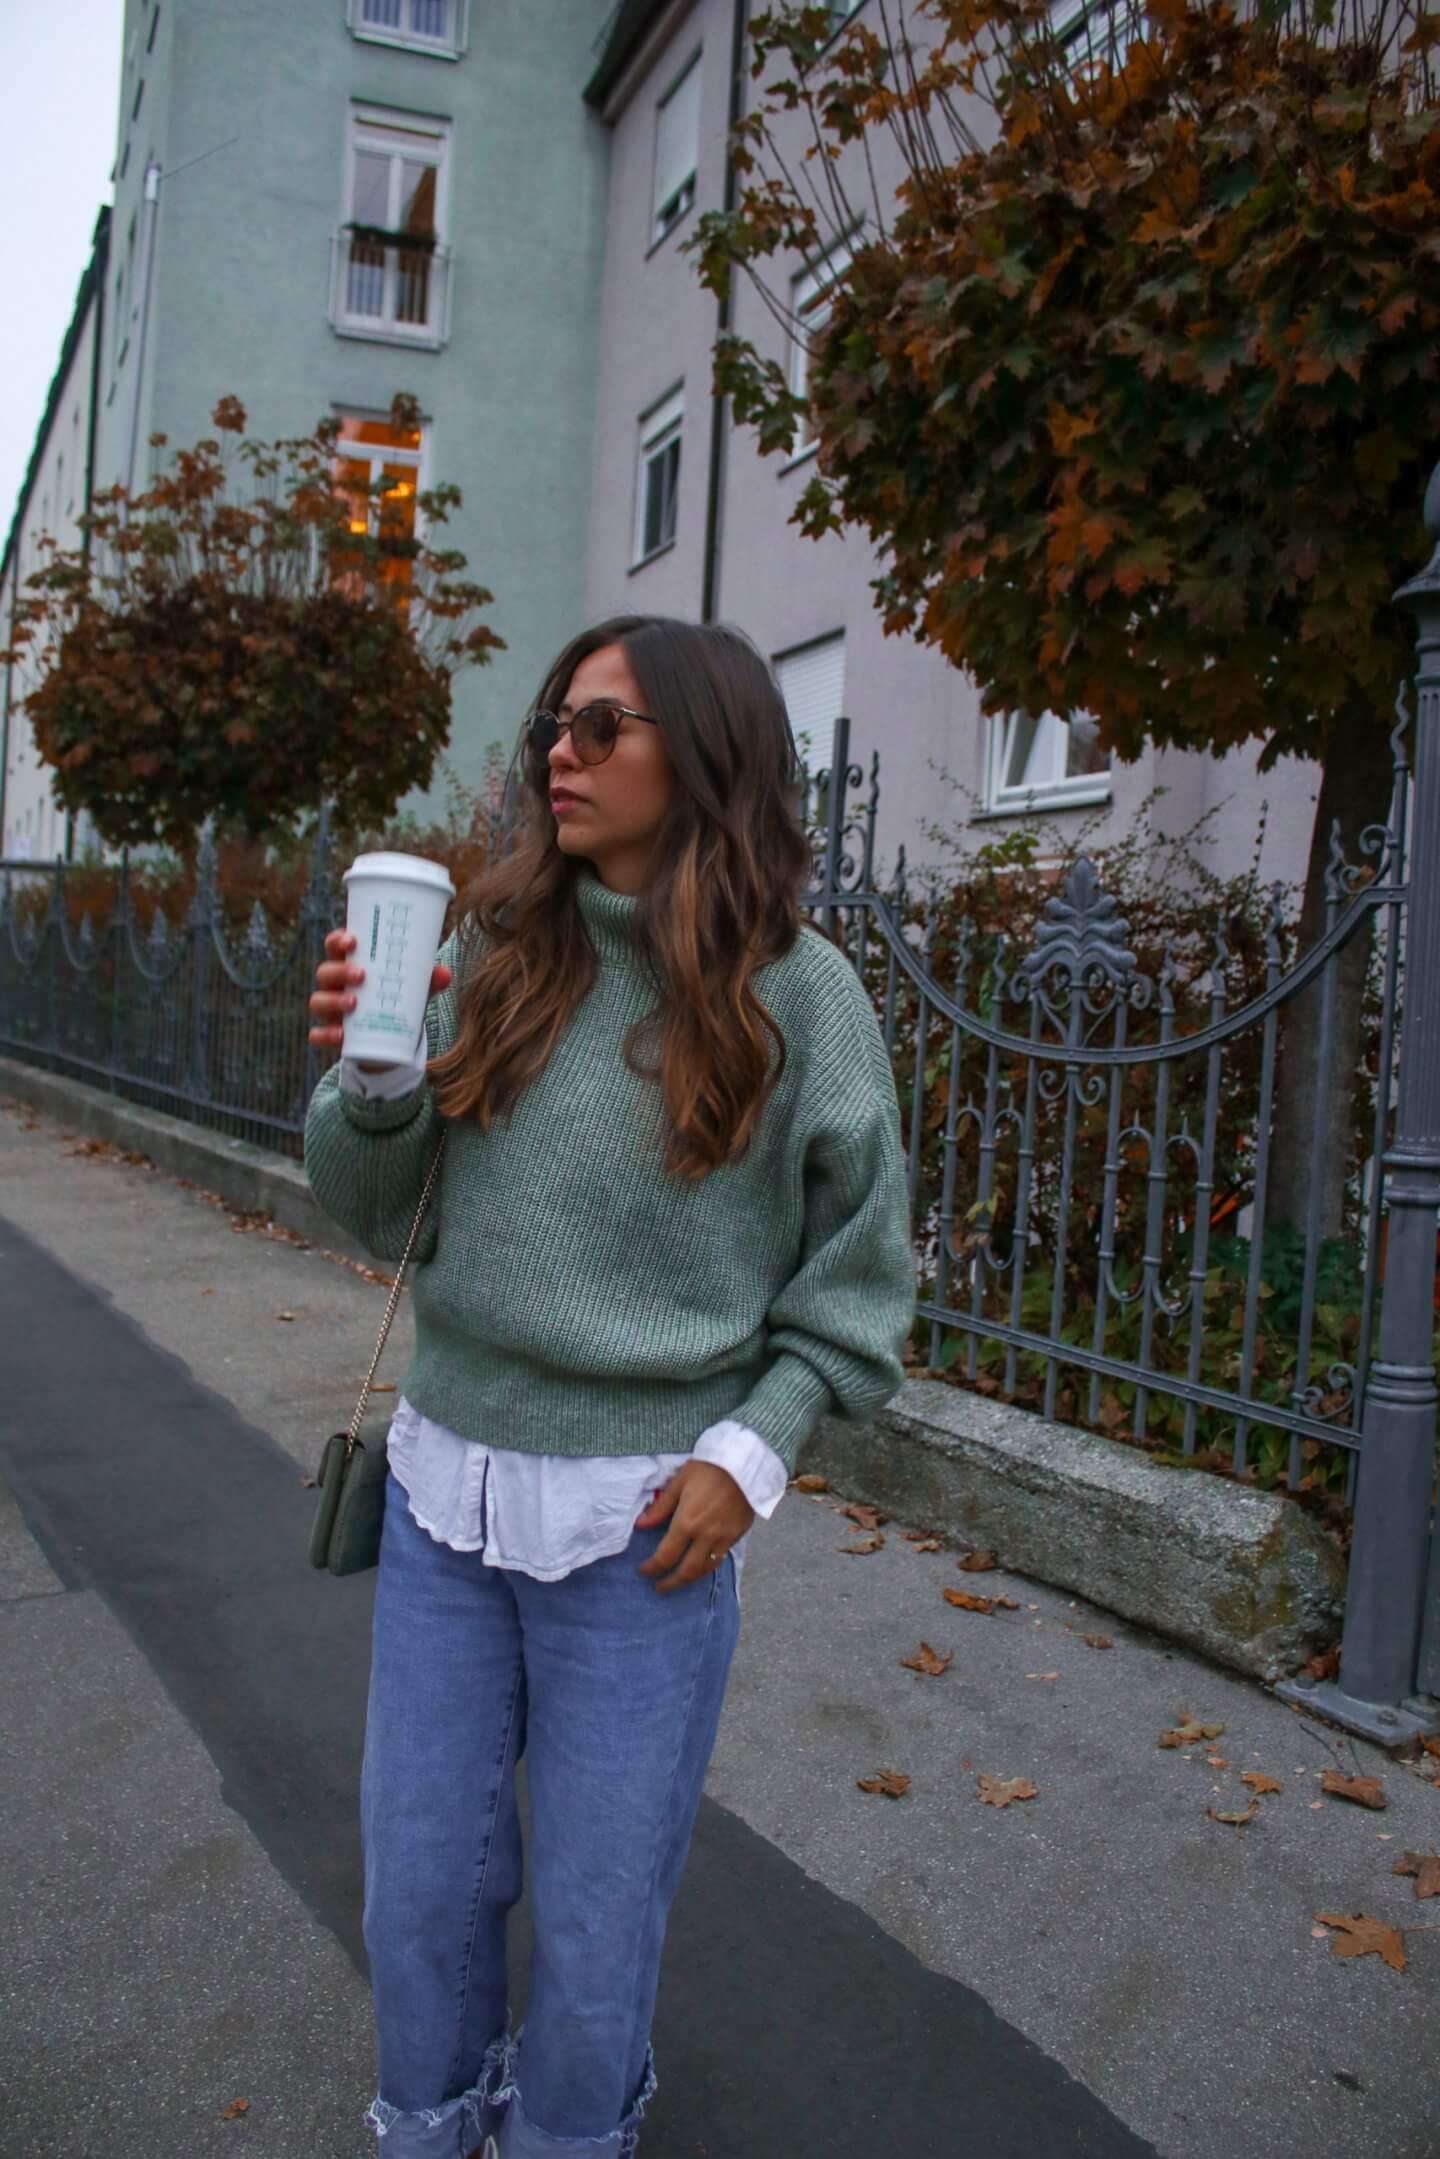 Grünen Pullover kombinieren- oversize Style